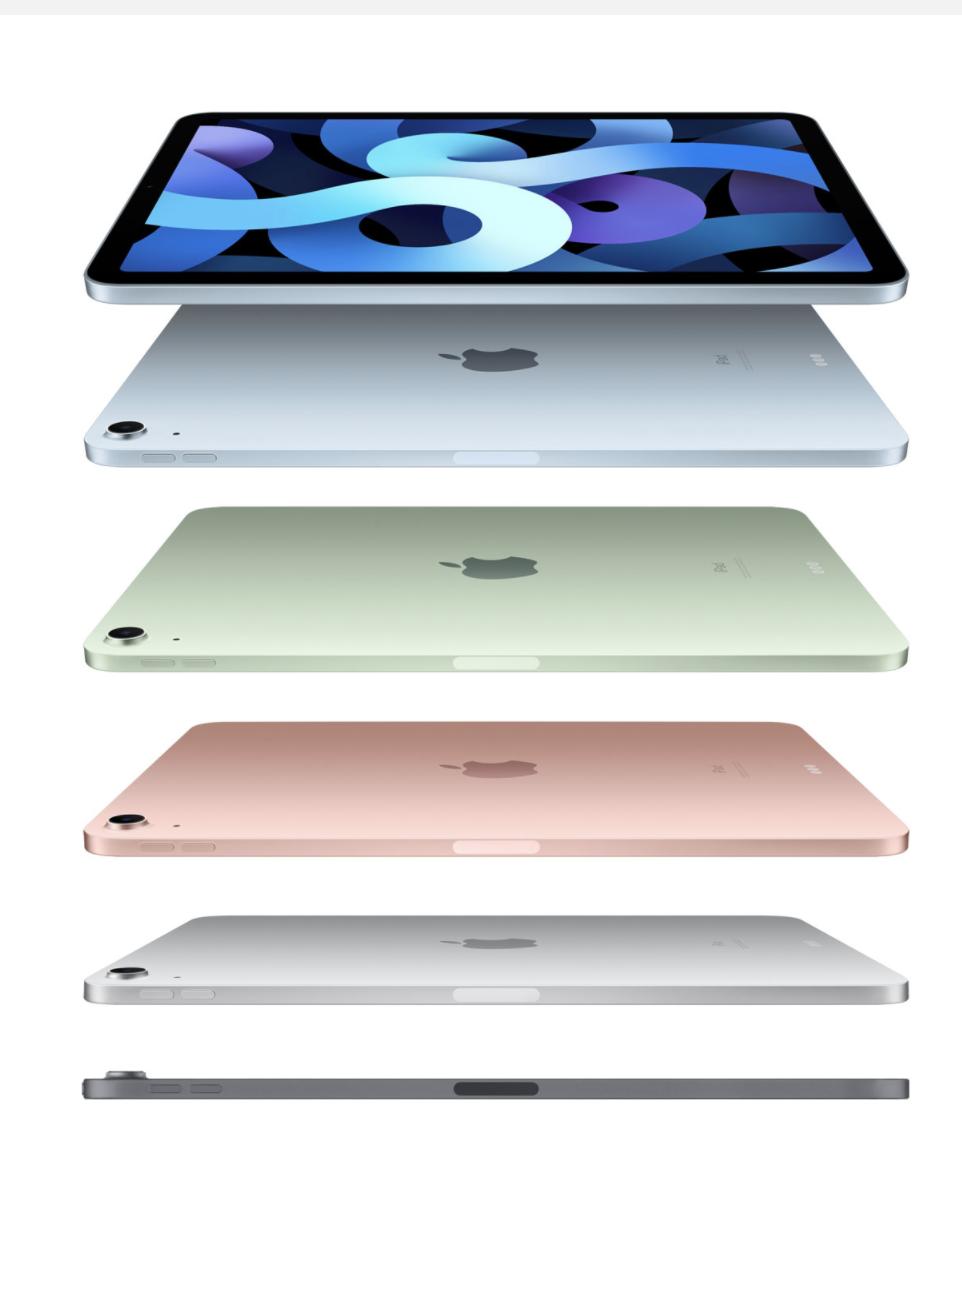 Ipad Air 4 Vs Ipad Pro 2020 Ipad Pro Ipad Air Ipad